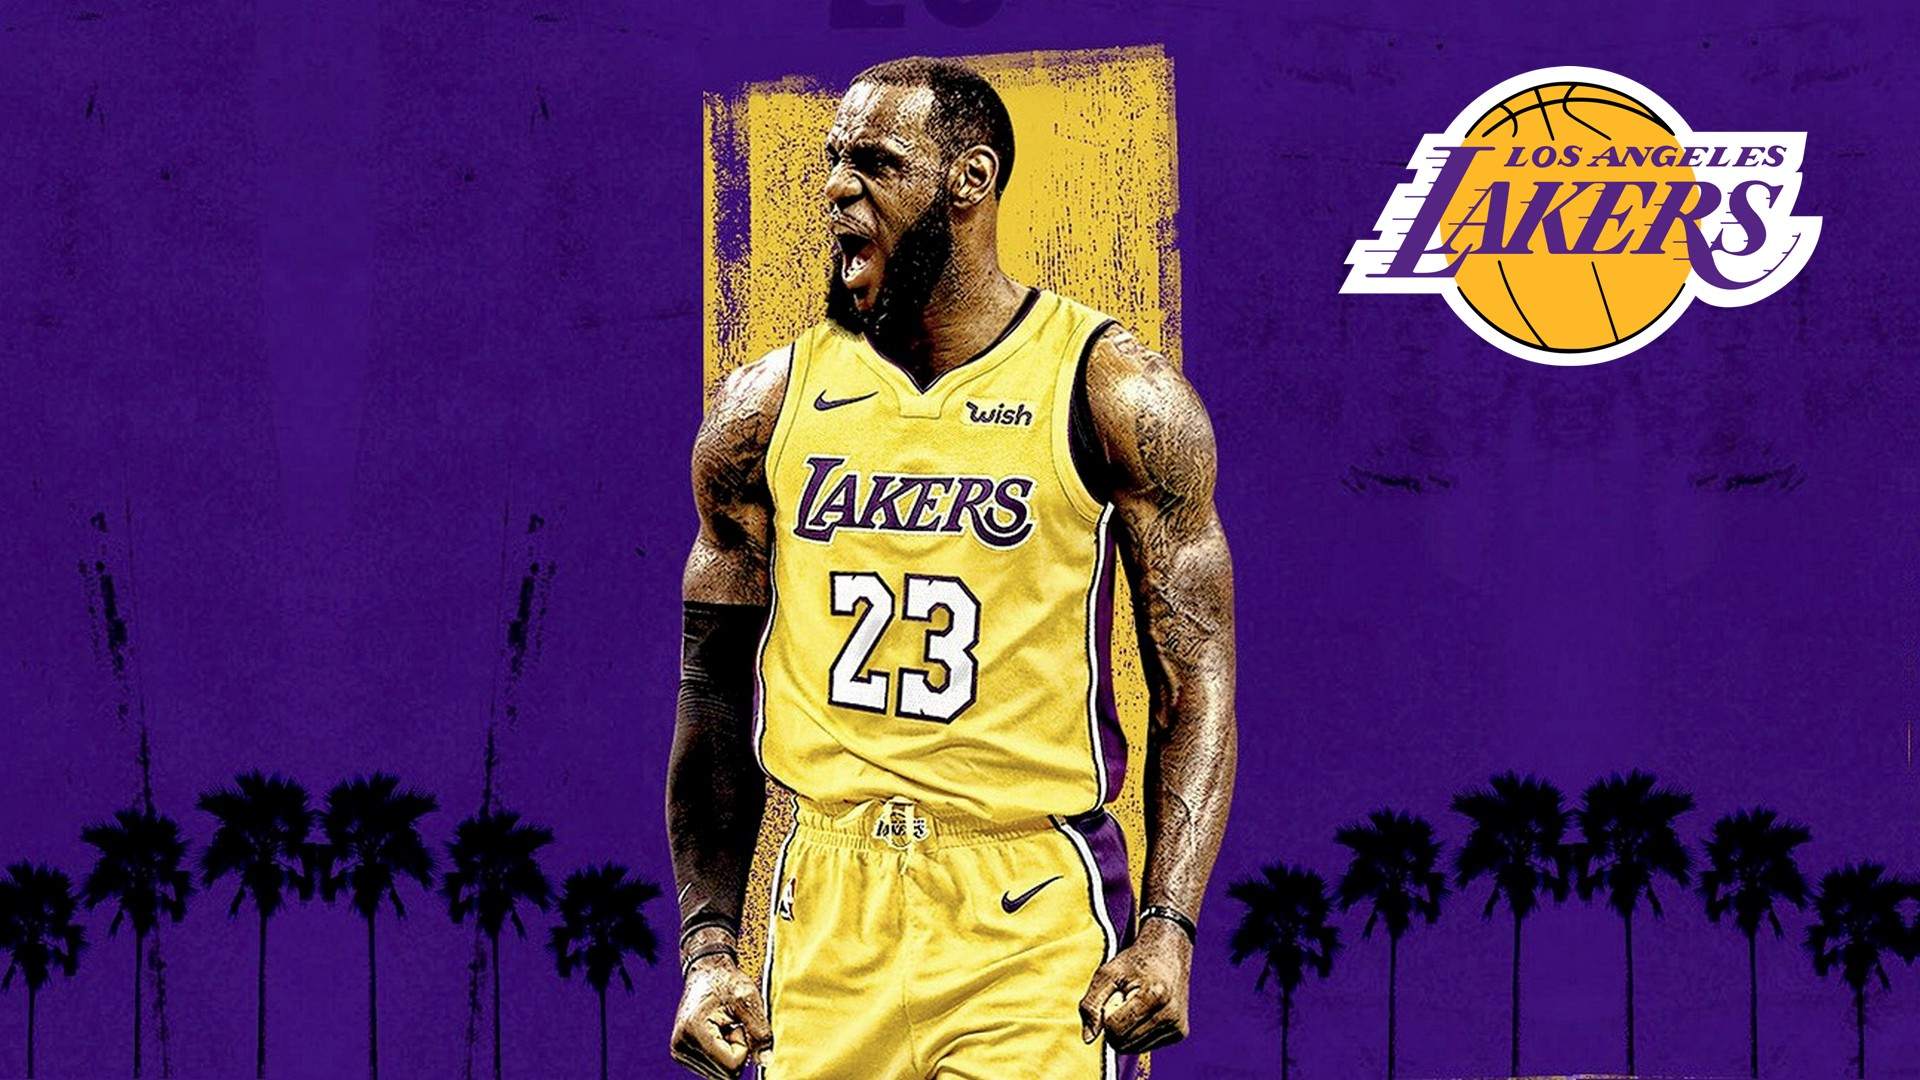 LeBron James Lakers Desktop Wallpapers 2020 Basketball Wallpaper 1920x1080